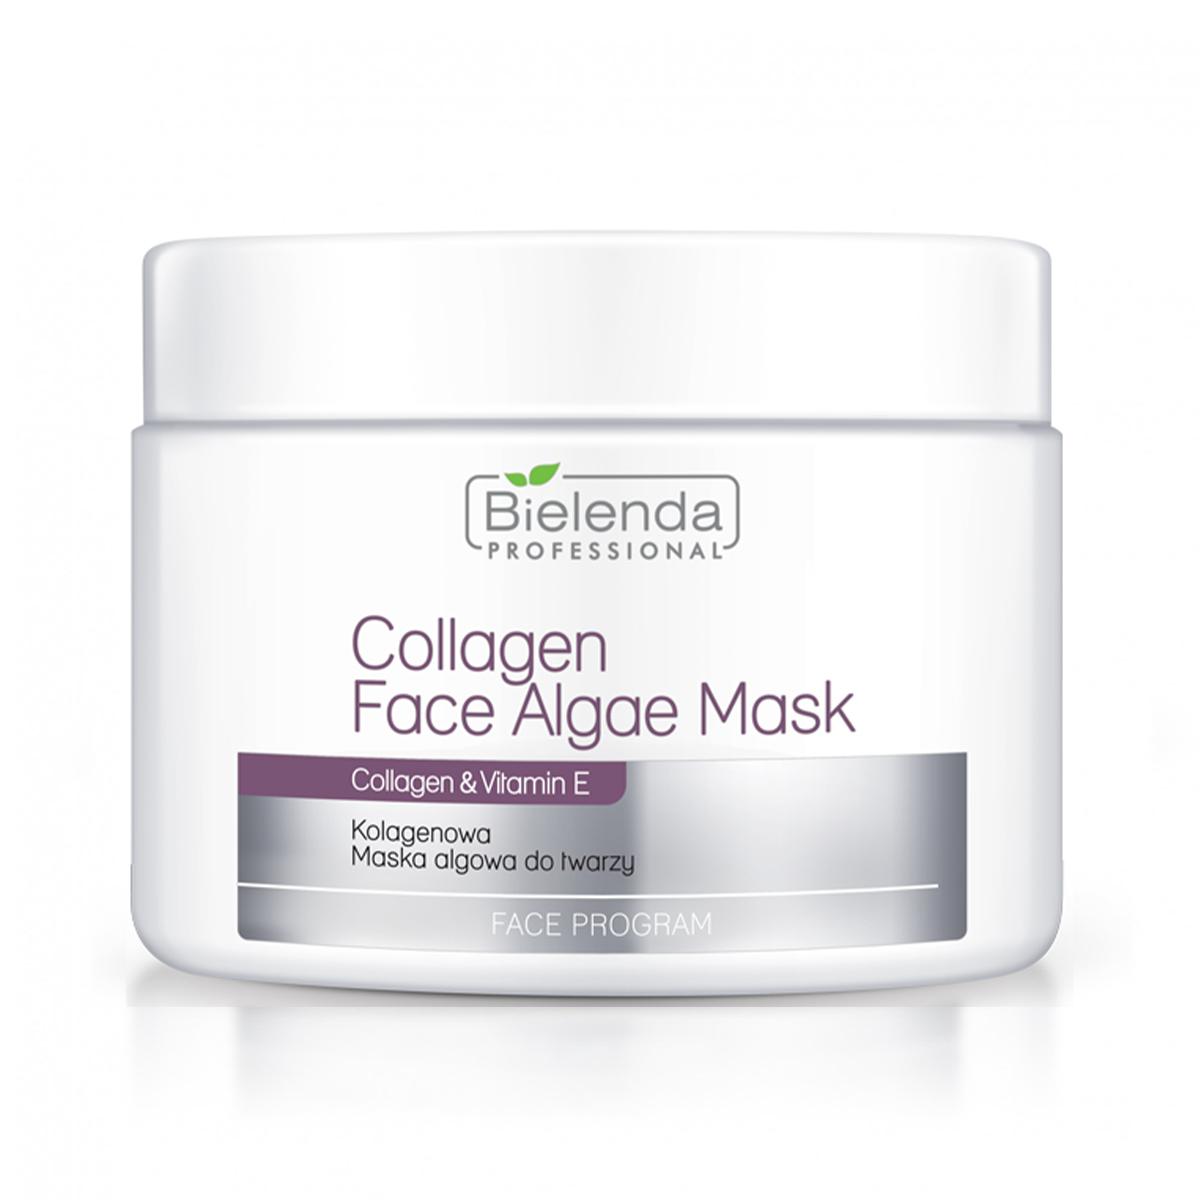 Algae mask Коллагеновая альгинатная маска для лица, 190 г.